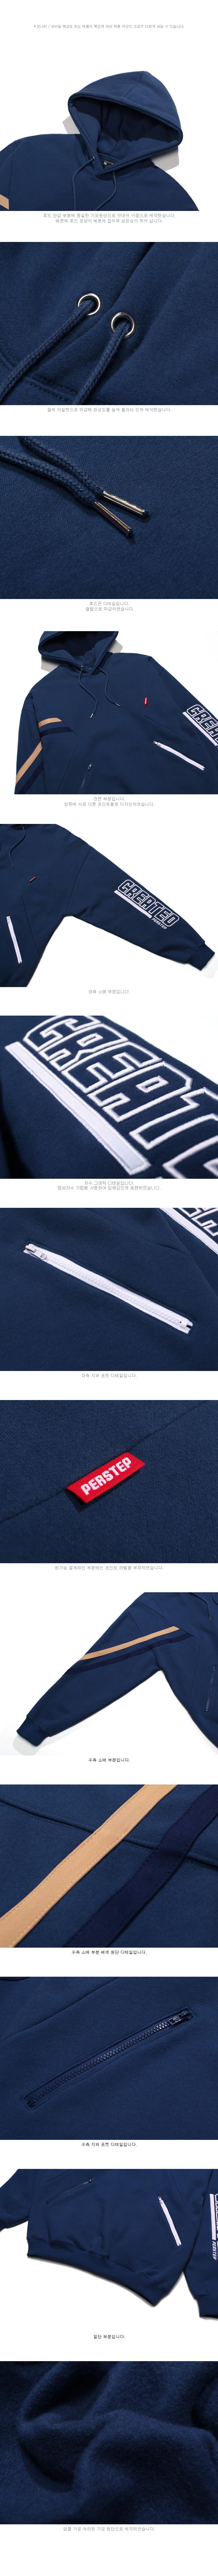 20190131_ps_jumbo_hoodie_navy_uk_02.jpg